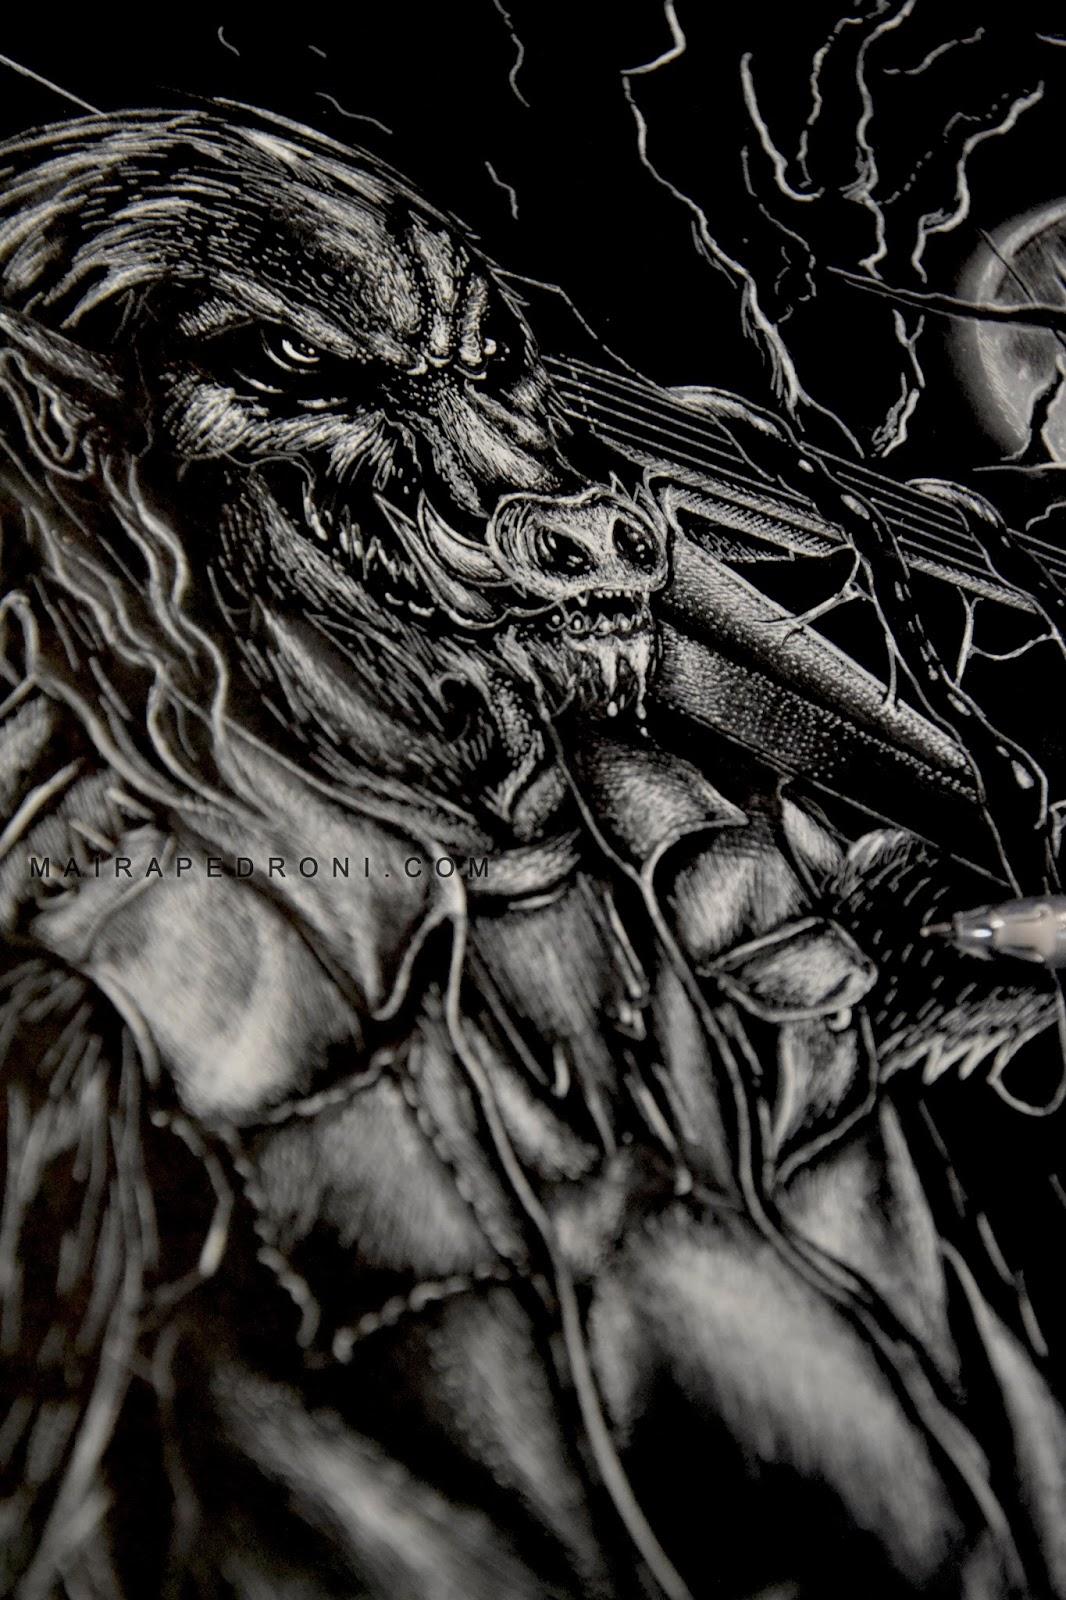 Design t shirt artwork - Progress Of A Commissioned Artwork T Shirt Design